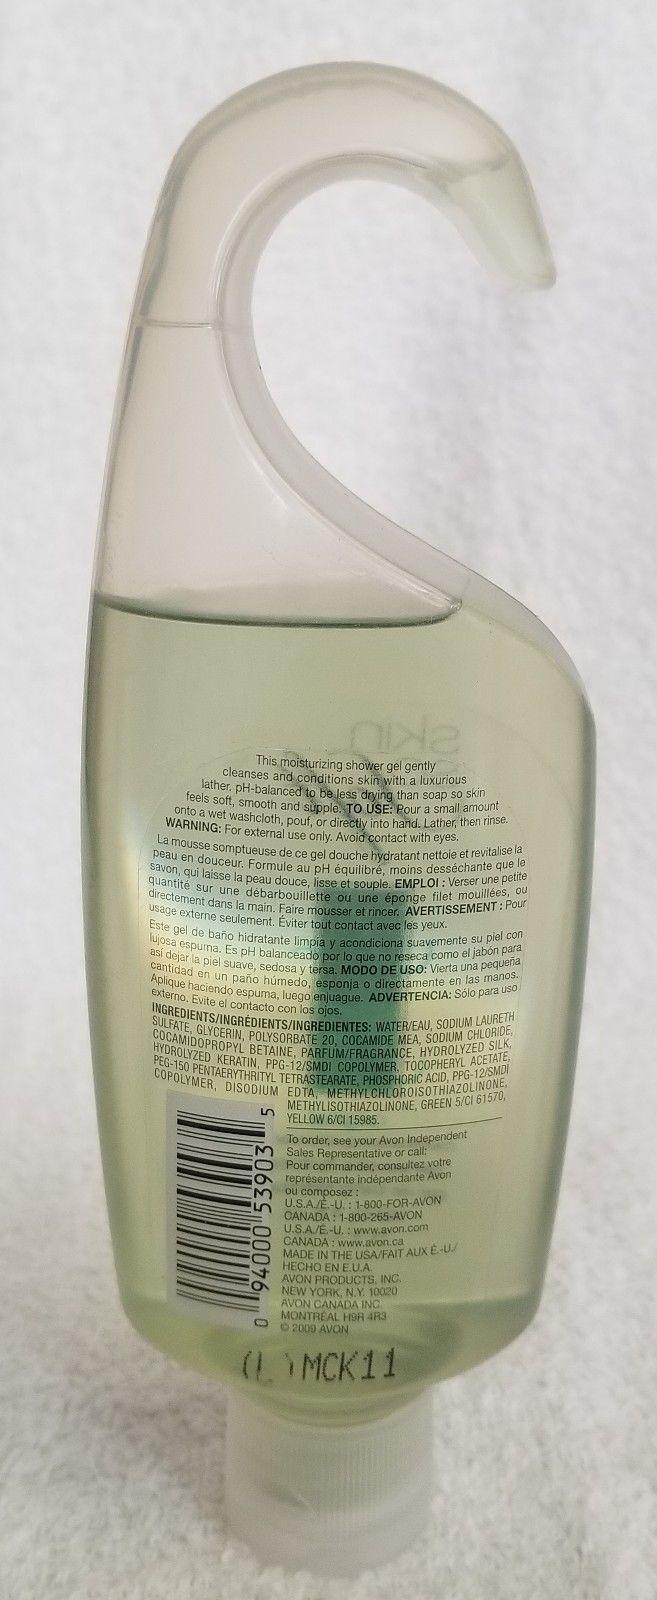 Avon Skin So Soft ORIGINAL Moisturizing Shower Gel Smooth Skin 5 oz/150mL New